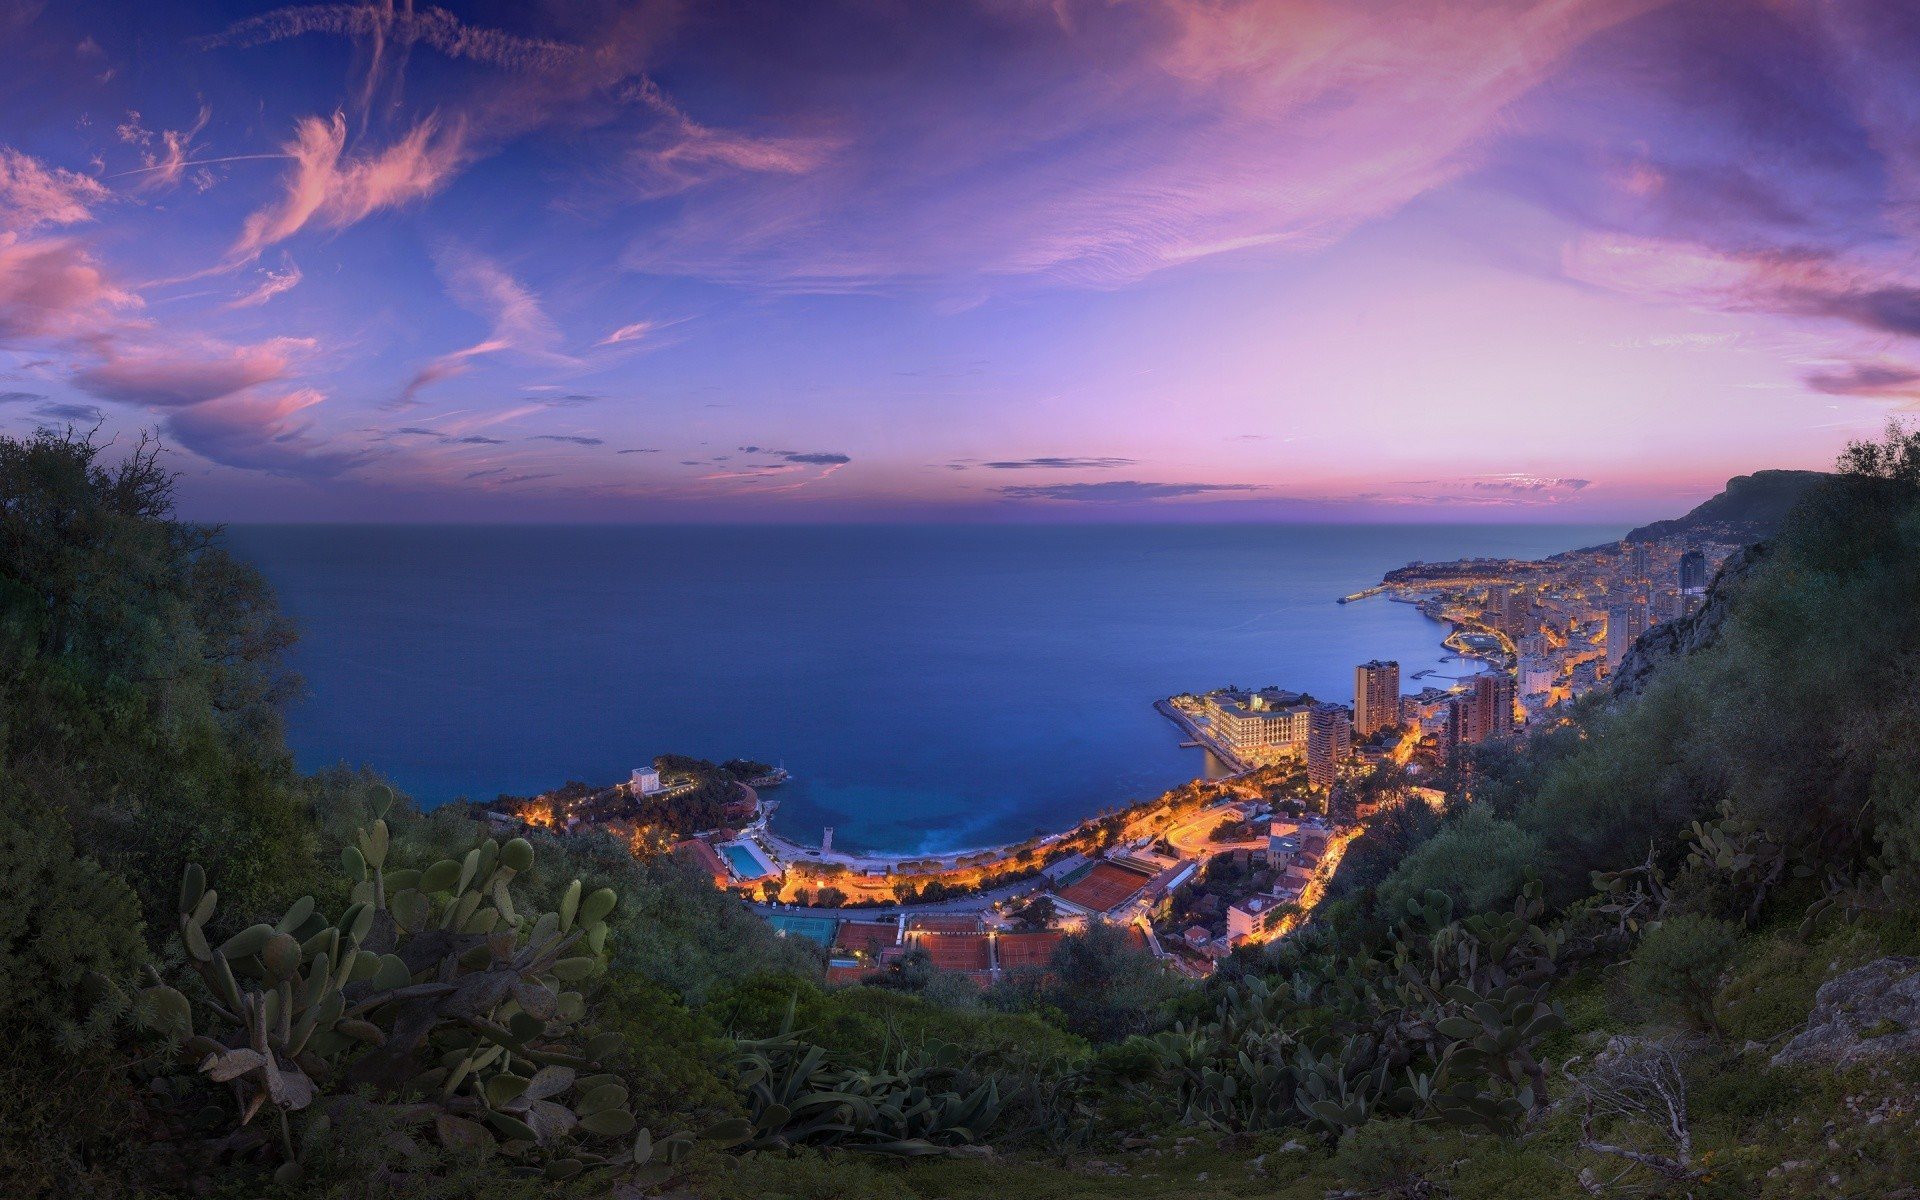 Free Monaco Purple Clouds Sunset phone wallpaper by shaklabazoo